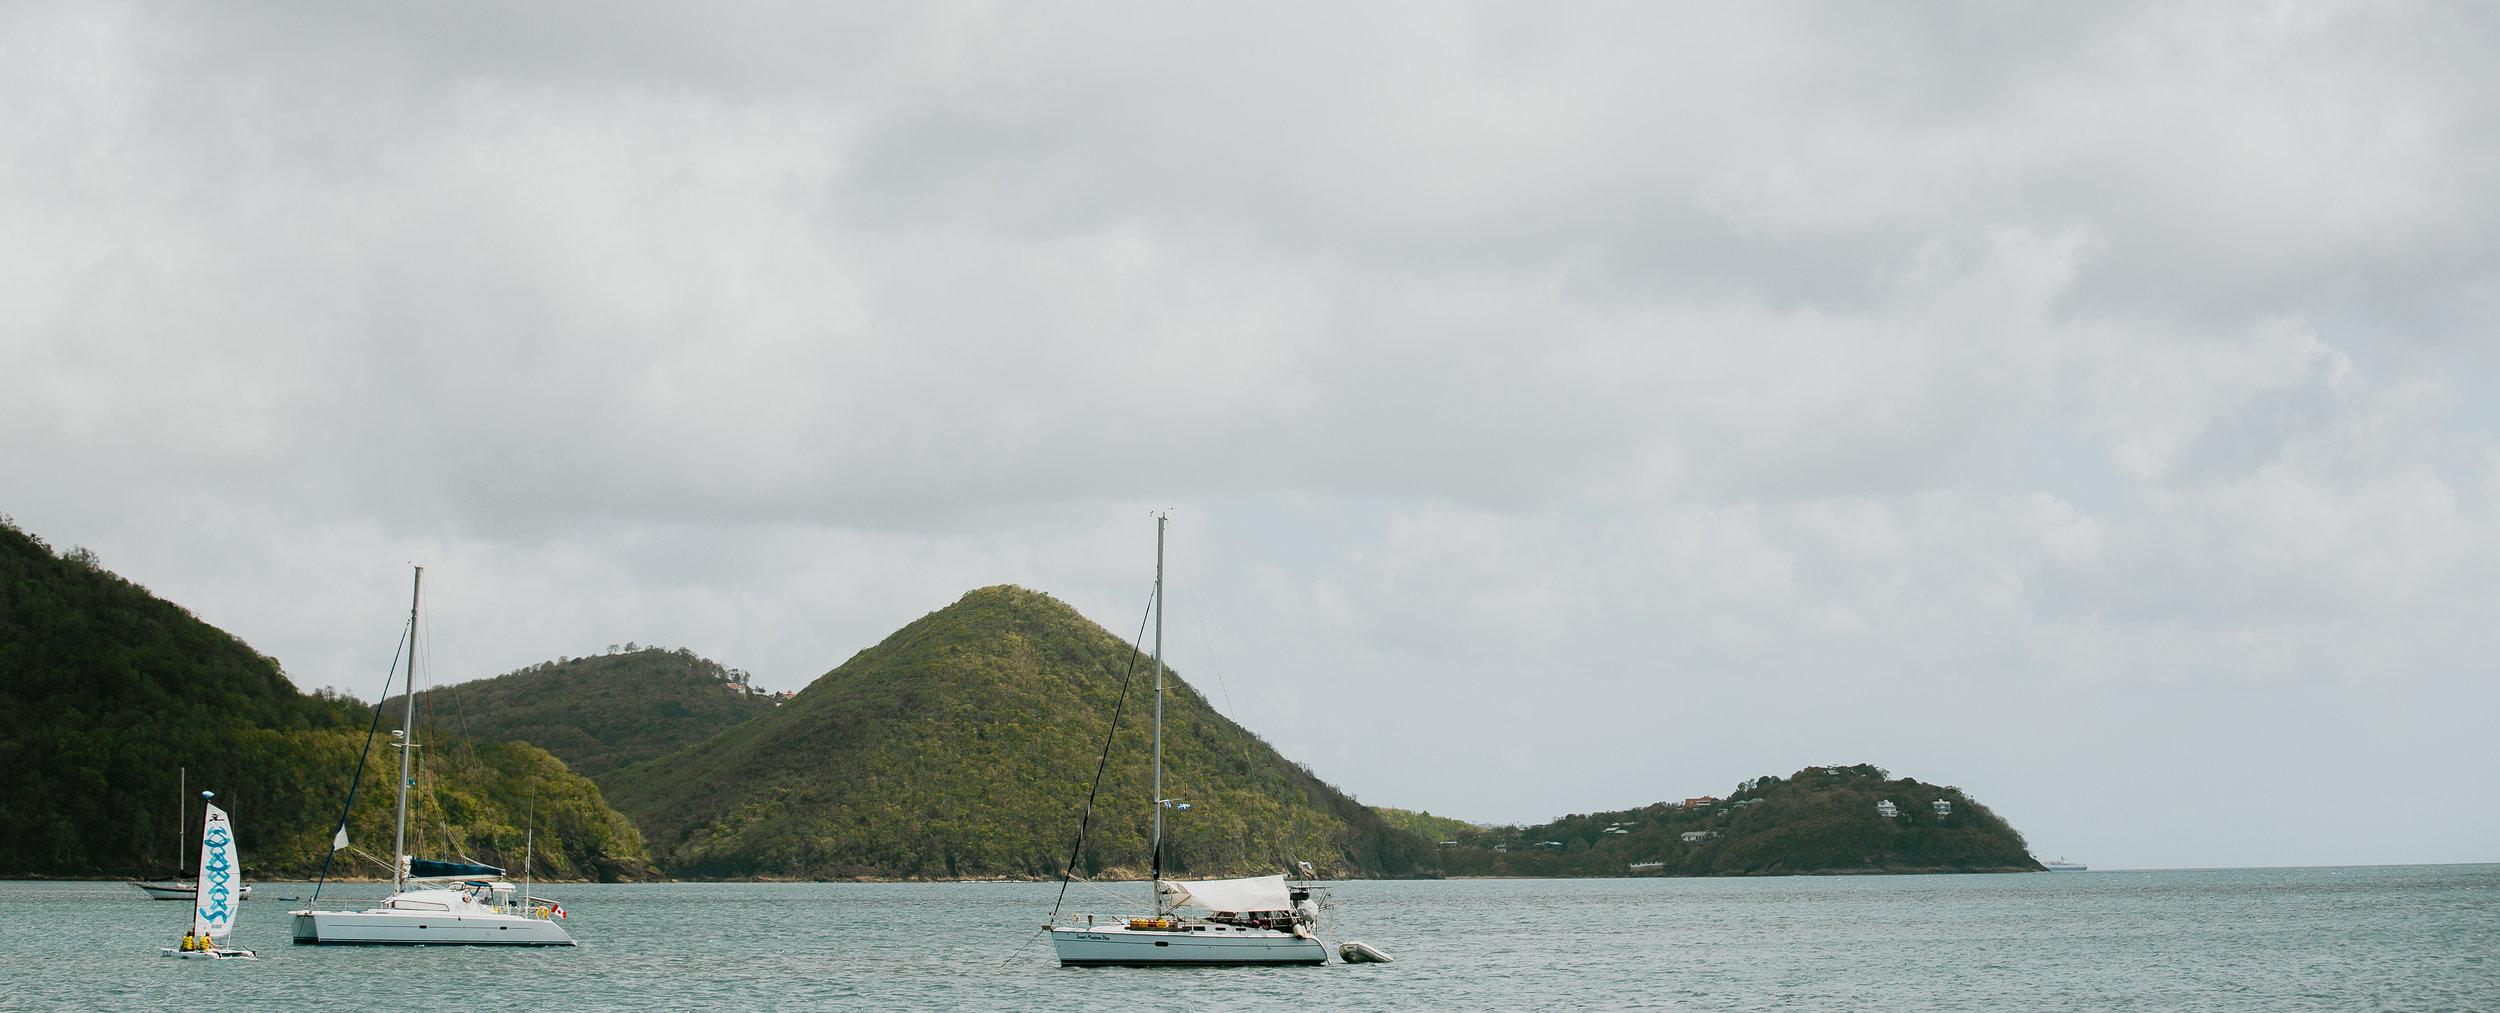 nicole-daacke-photography-destination-wedding-in-st-lucia-sandals-la-toc-intimate-island-wedding-carribean-elopement-photographer-chill-island-wedding-28.jpg